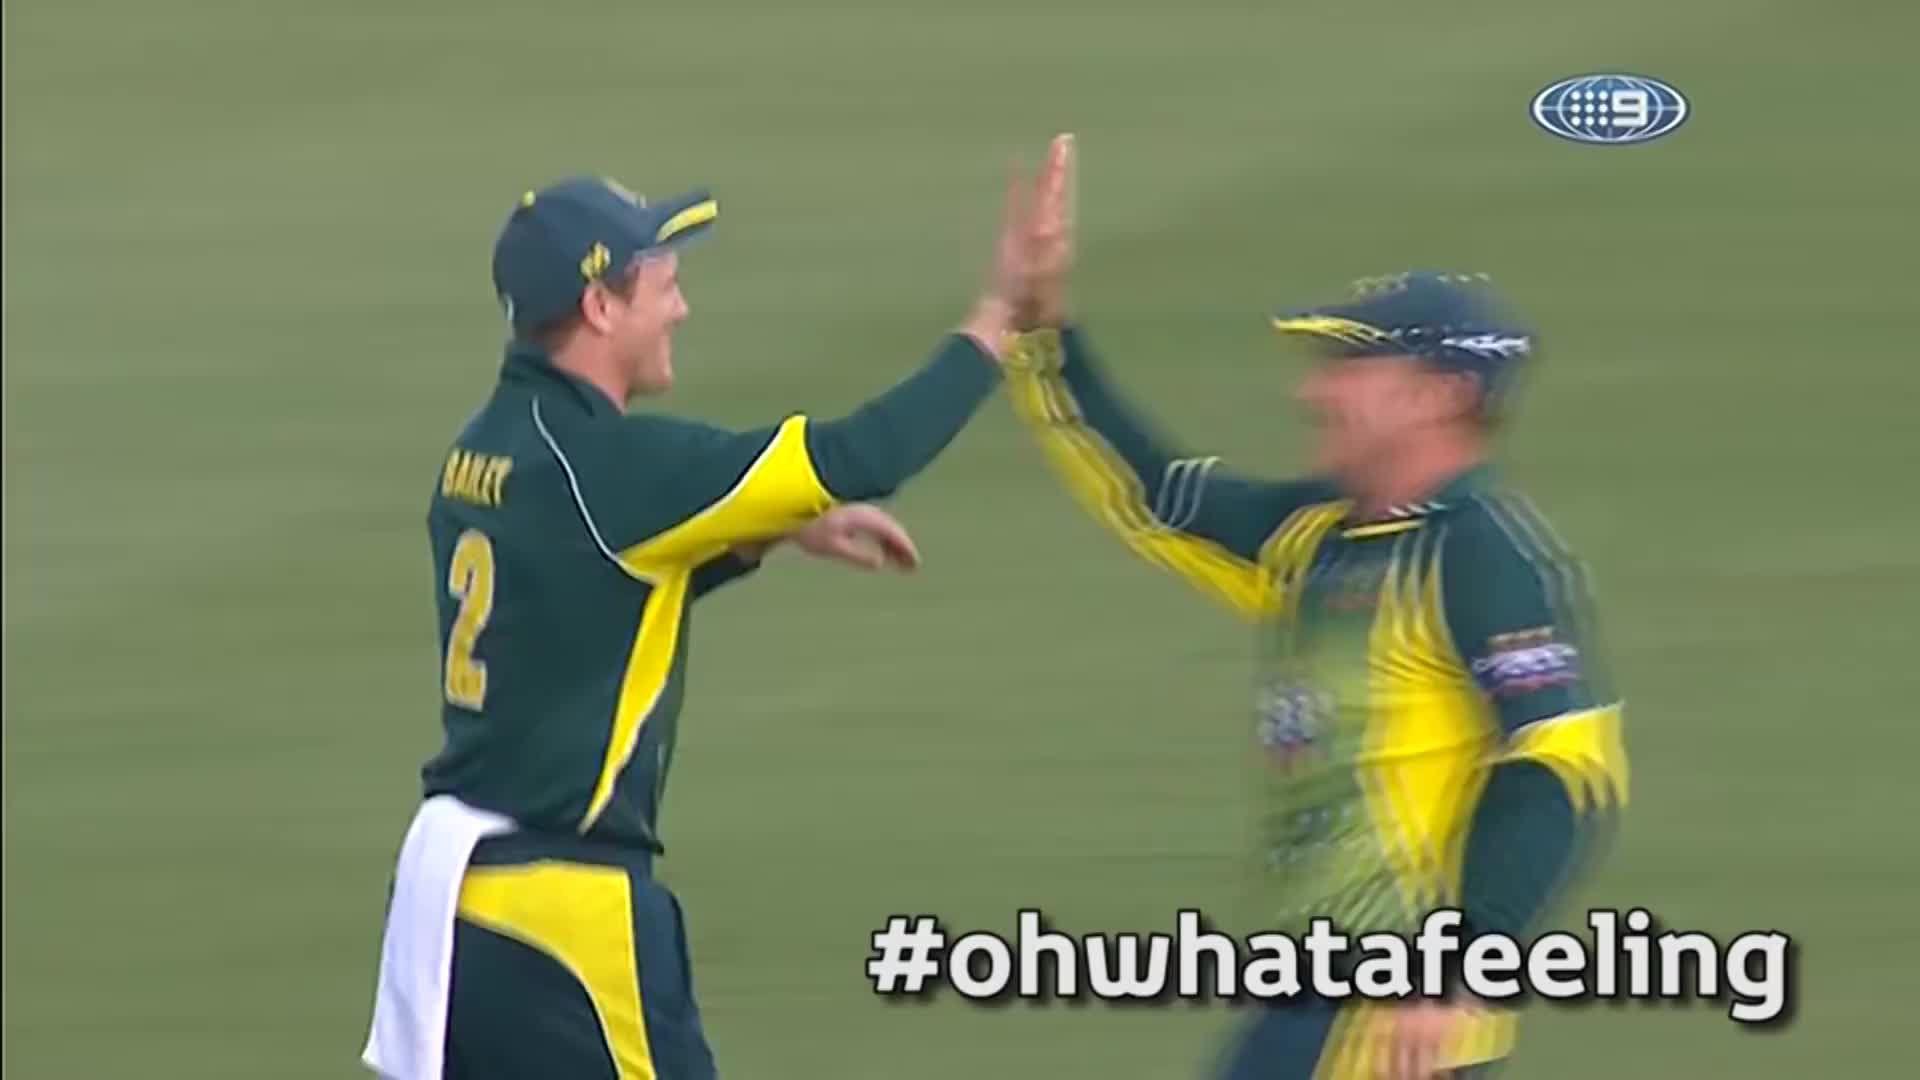 Pin On Wonderful Cricket Video